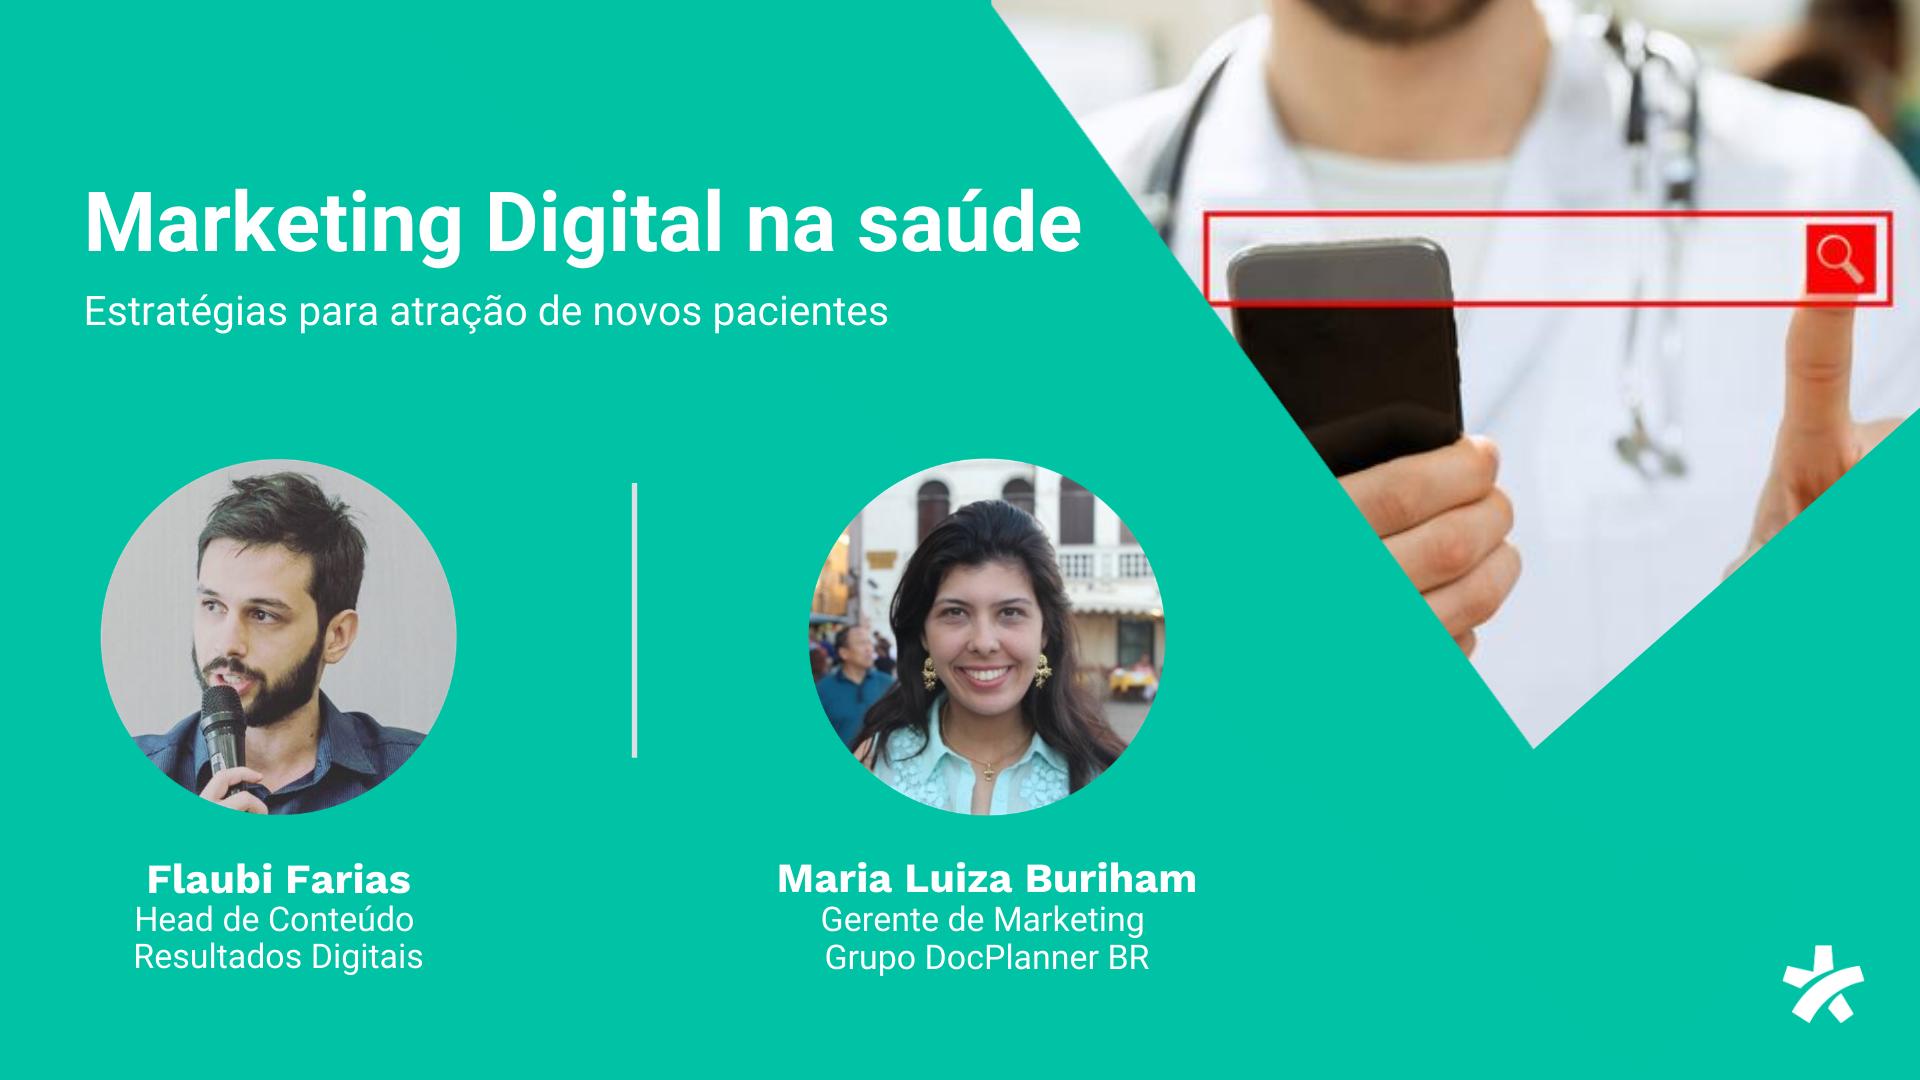 Marketing Digital na Saúde